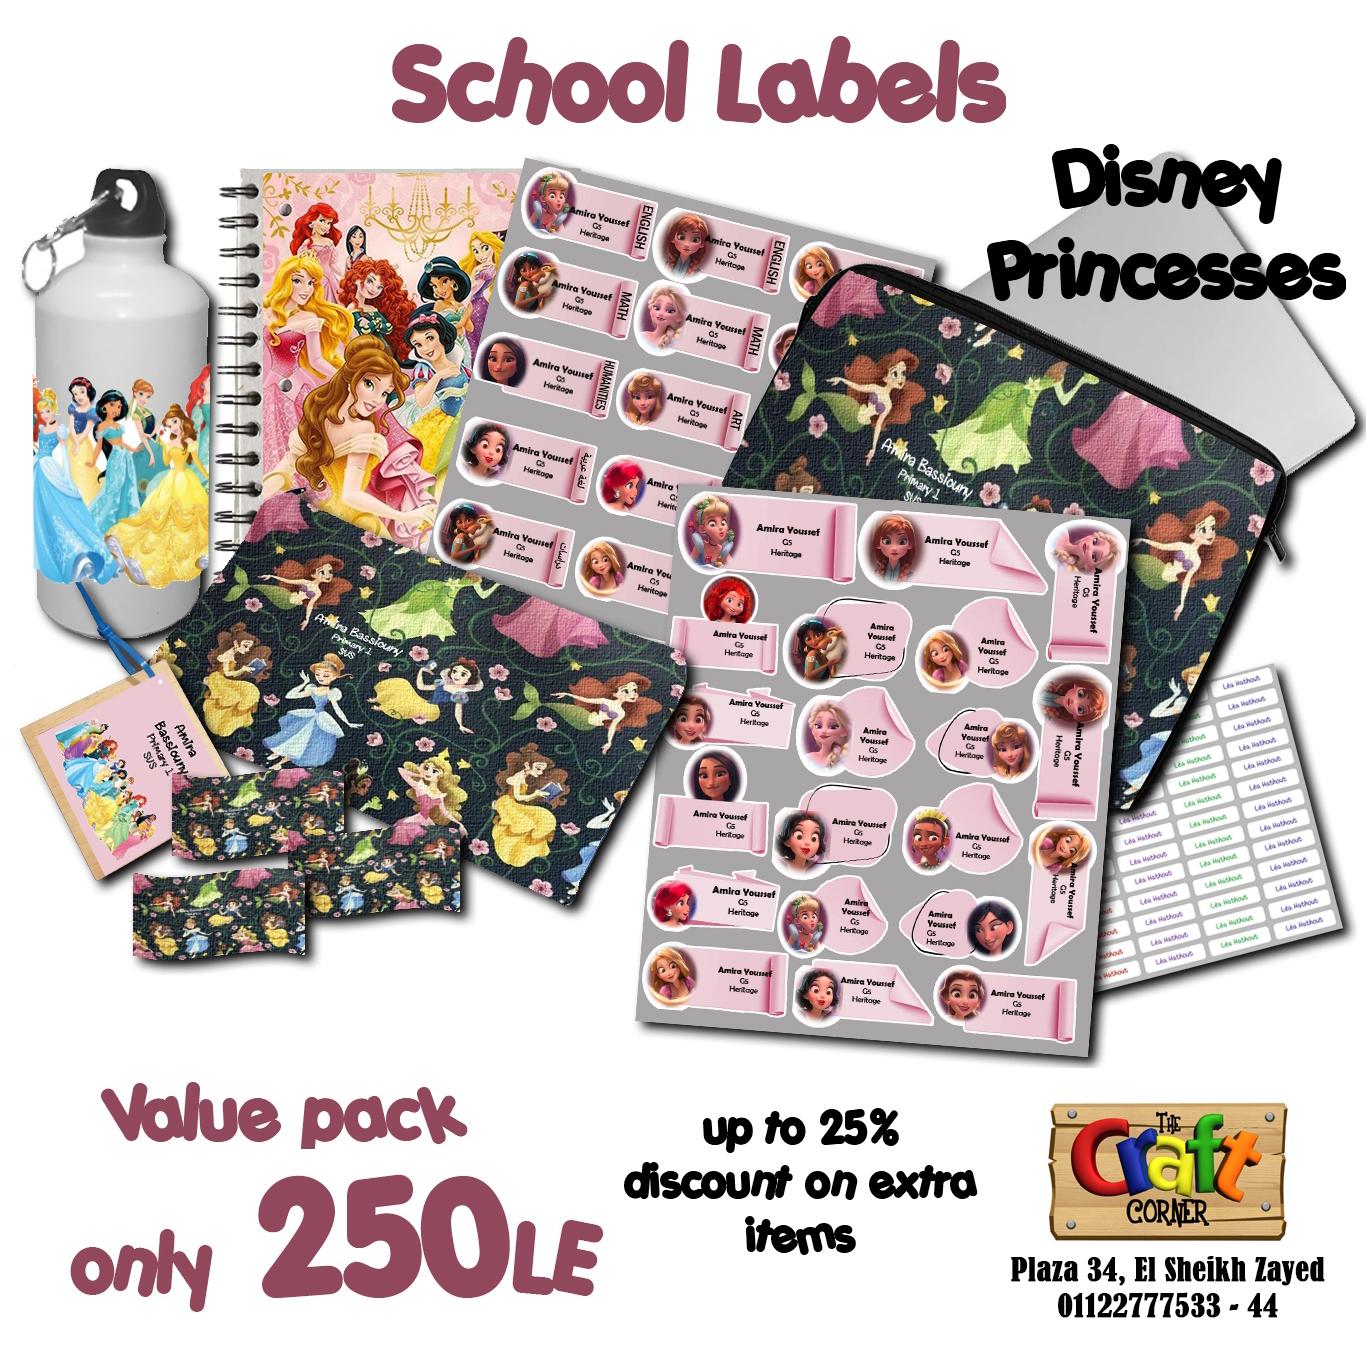 Disney princesses ad small